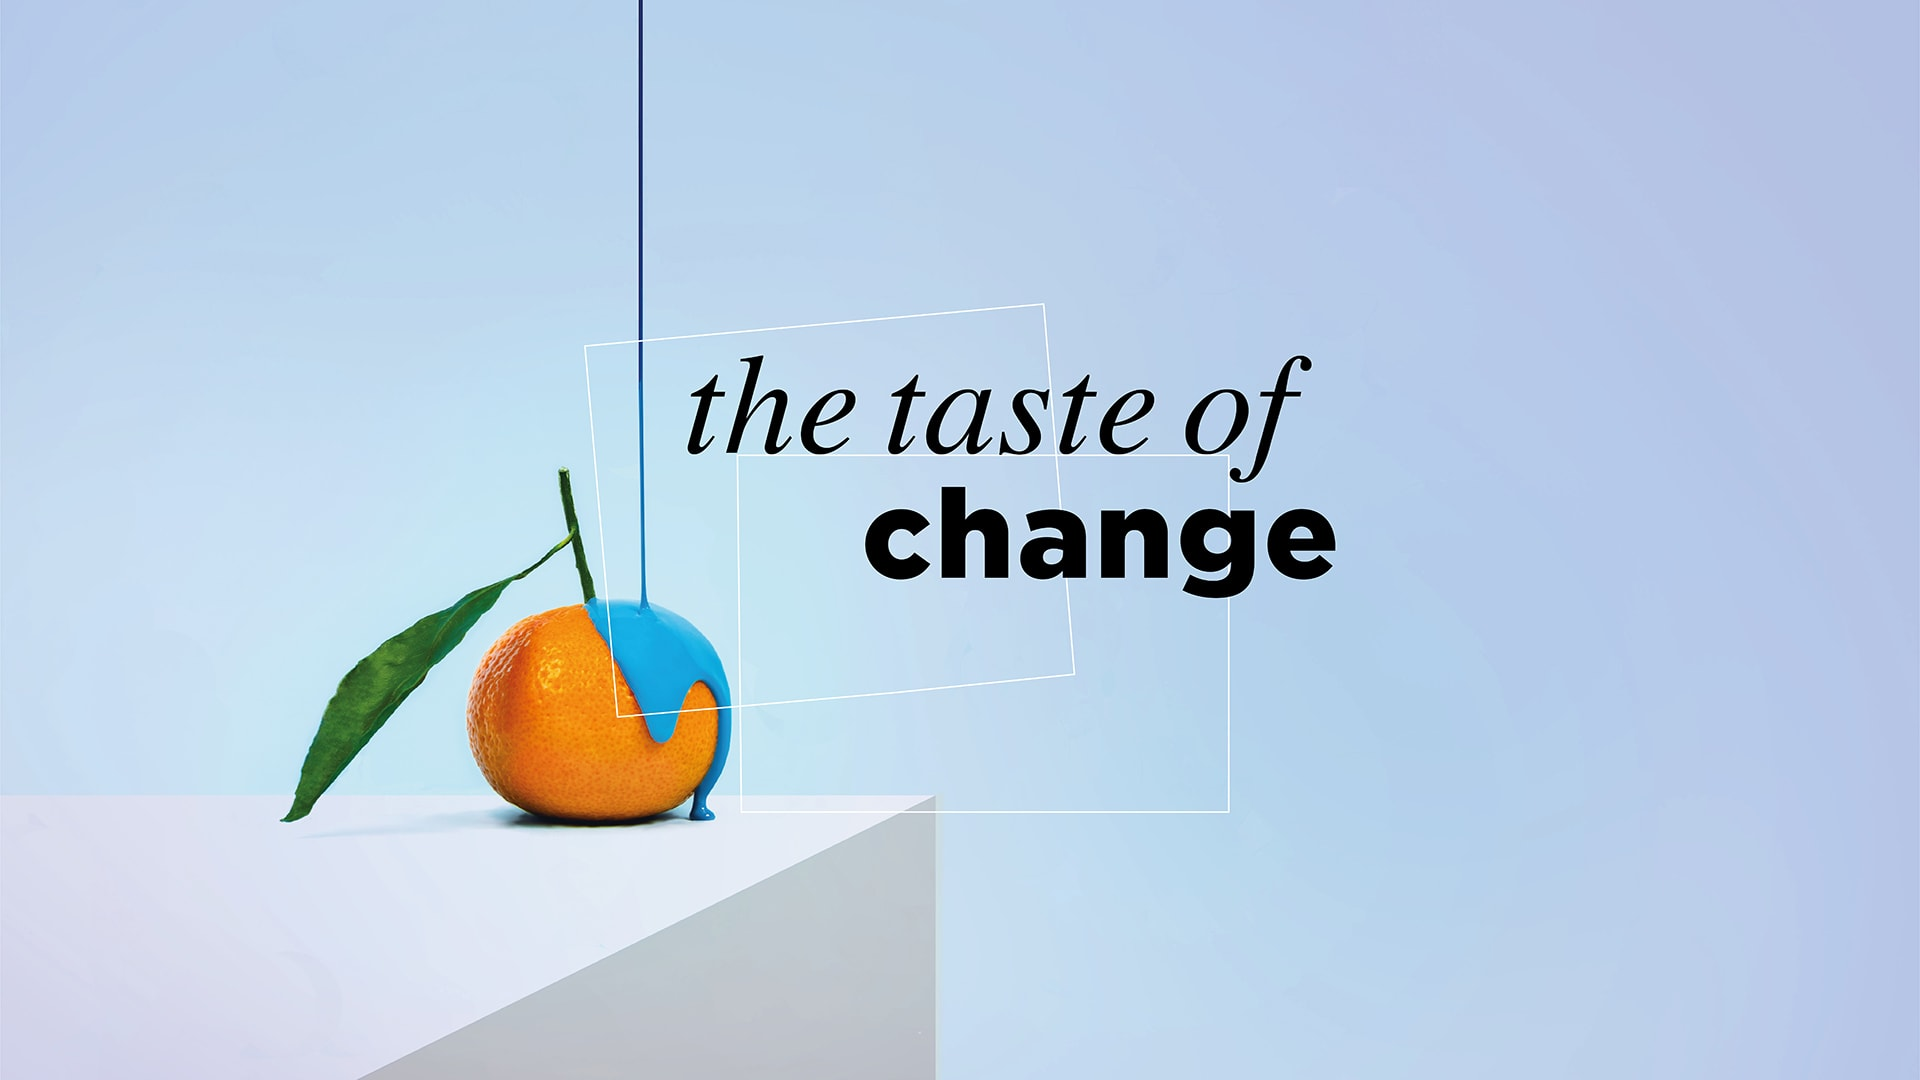 https://www.lewismoberly.com/wp-content/uploads/2021/09/Changing-Tastes-Thumbnail.jpg